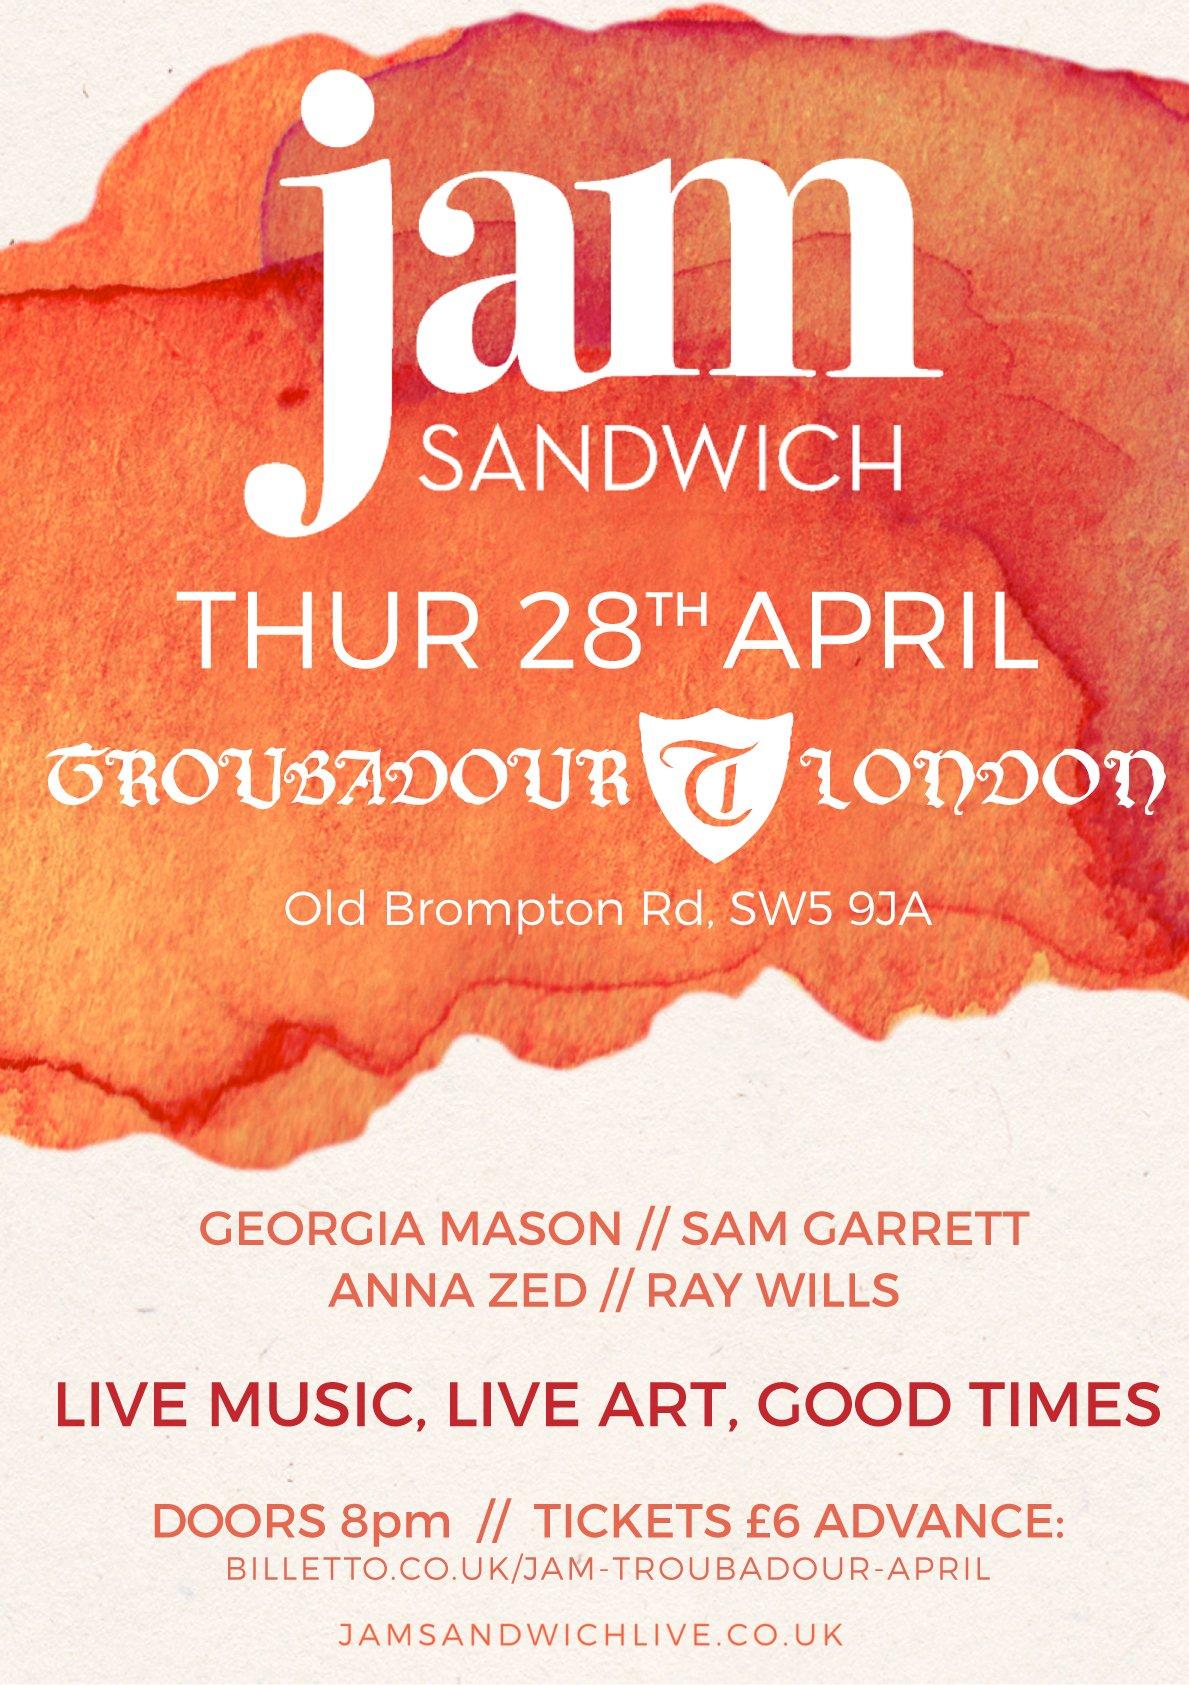 Poster for Jam-Sandwich live music at The Troubadour London 28th April 2016